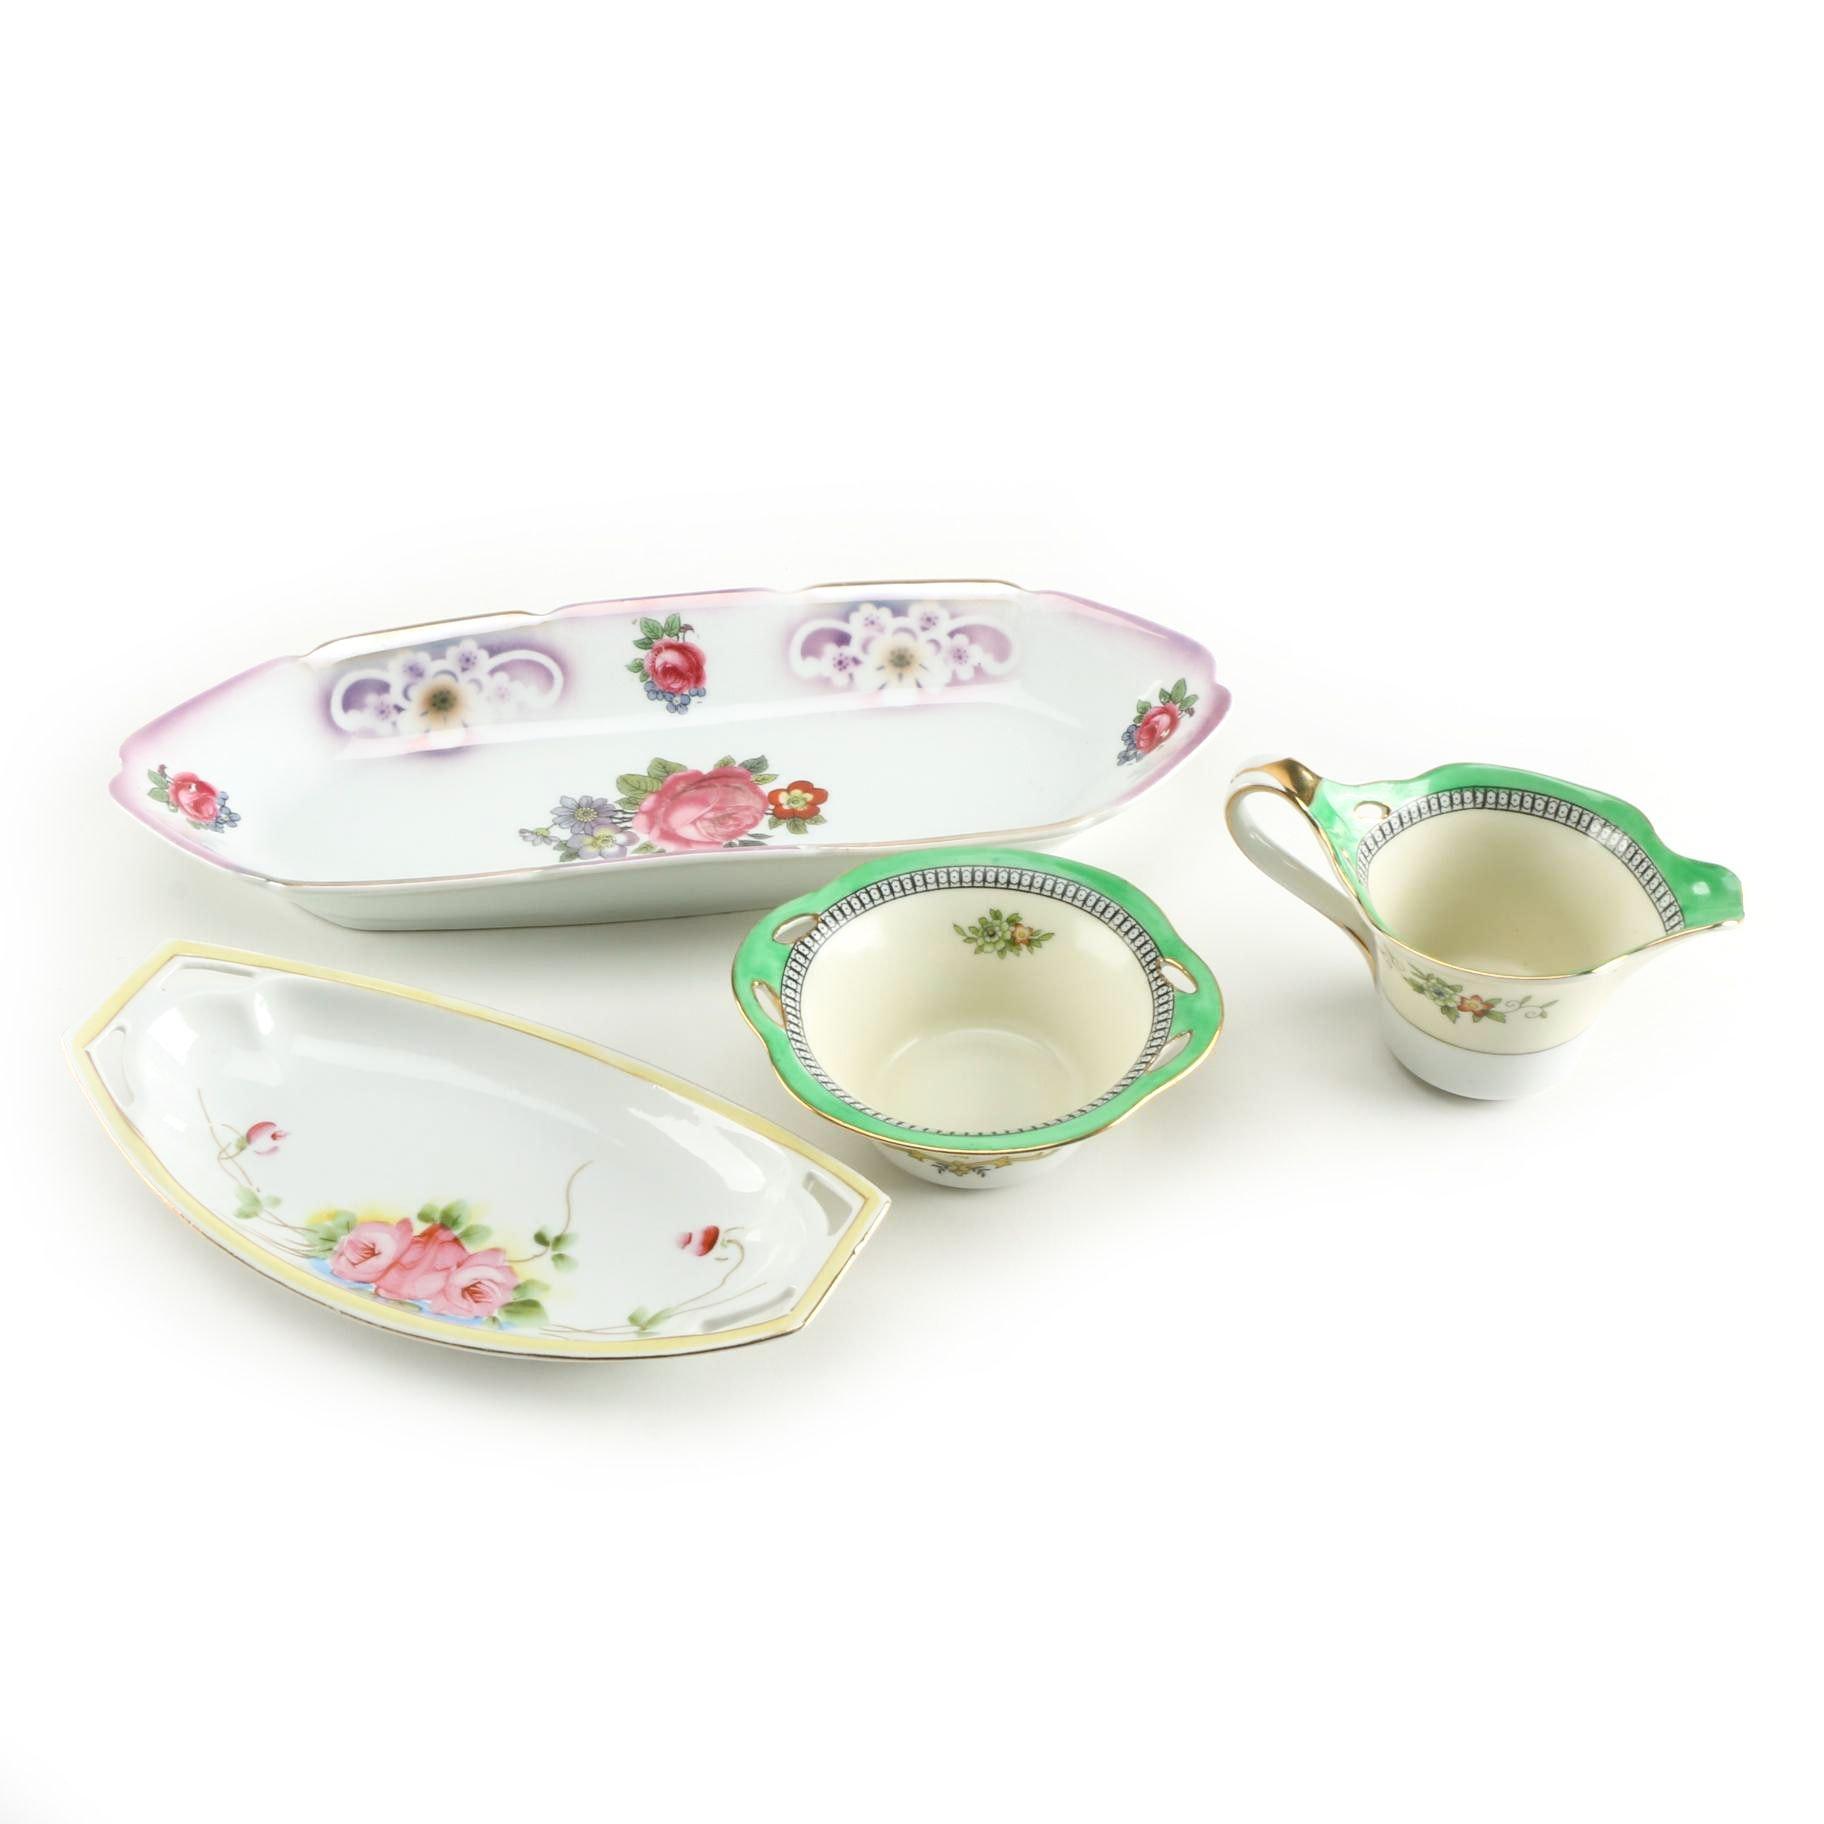 "Assortment of Vintage Dishes Including Noritaki ""Roseara"""